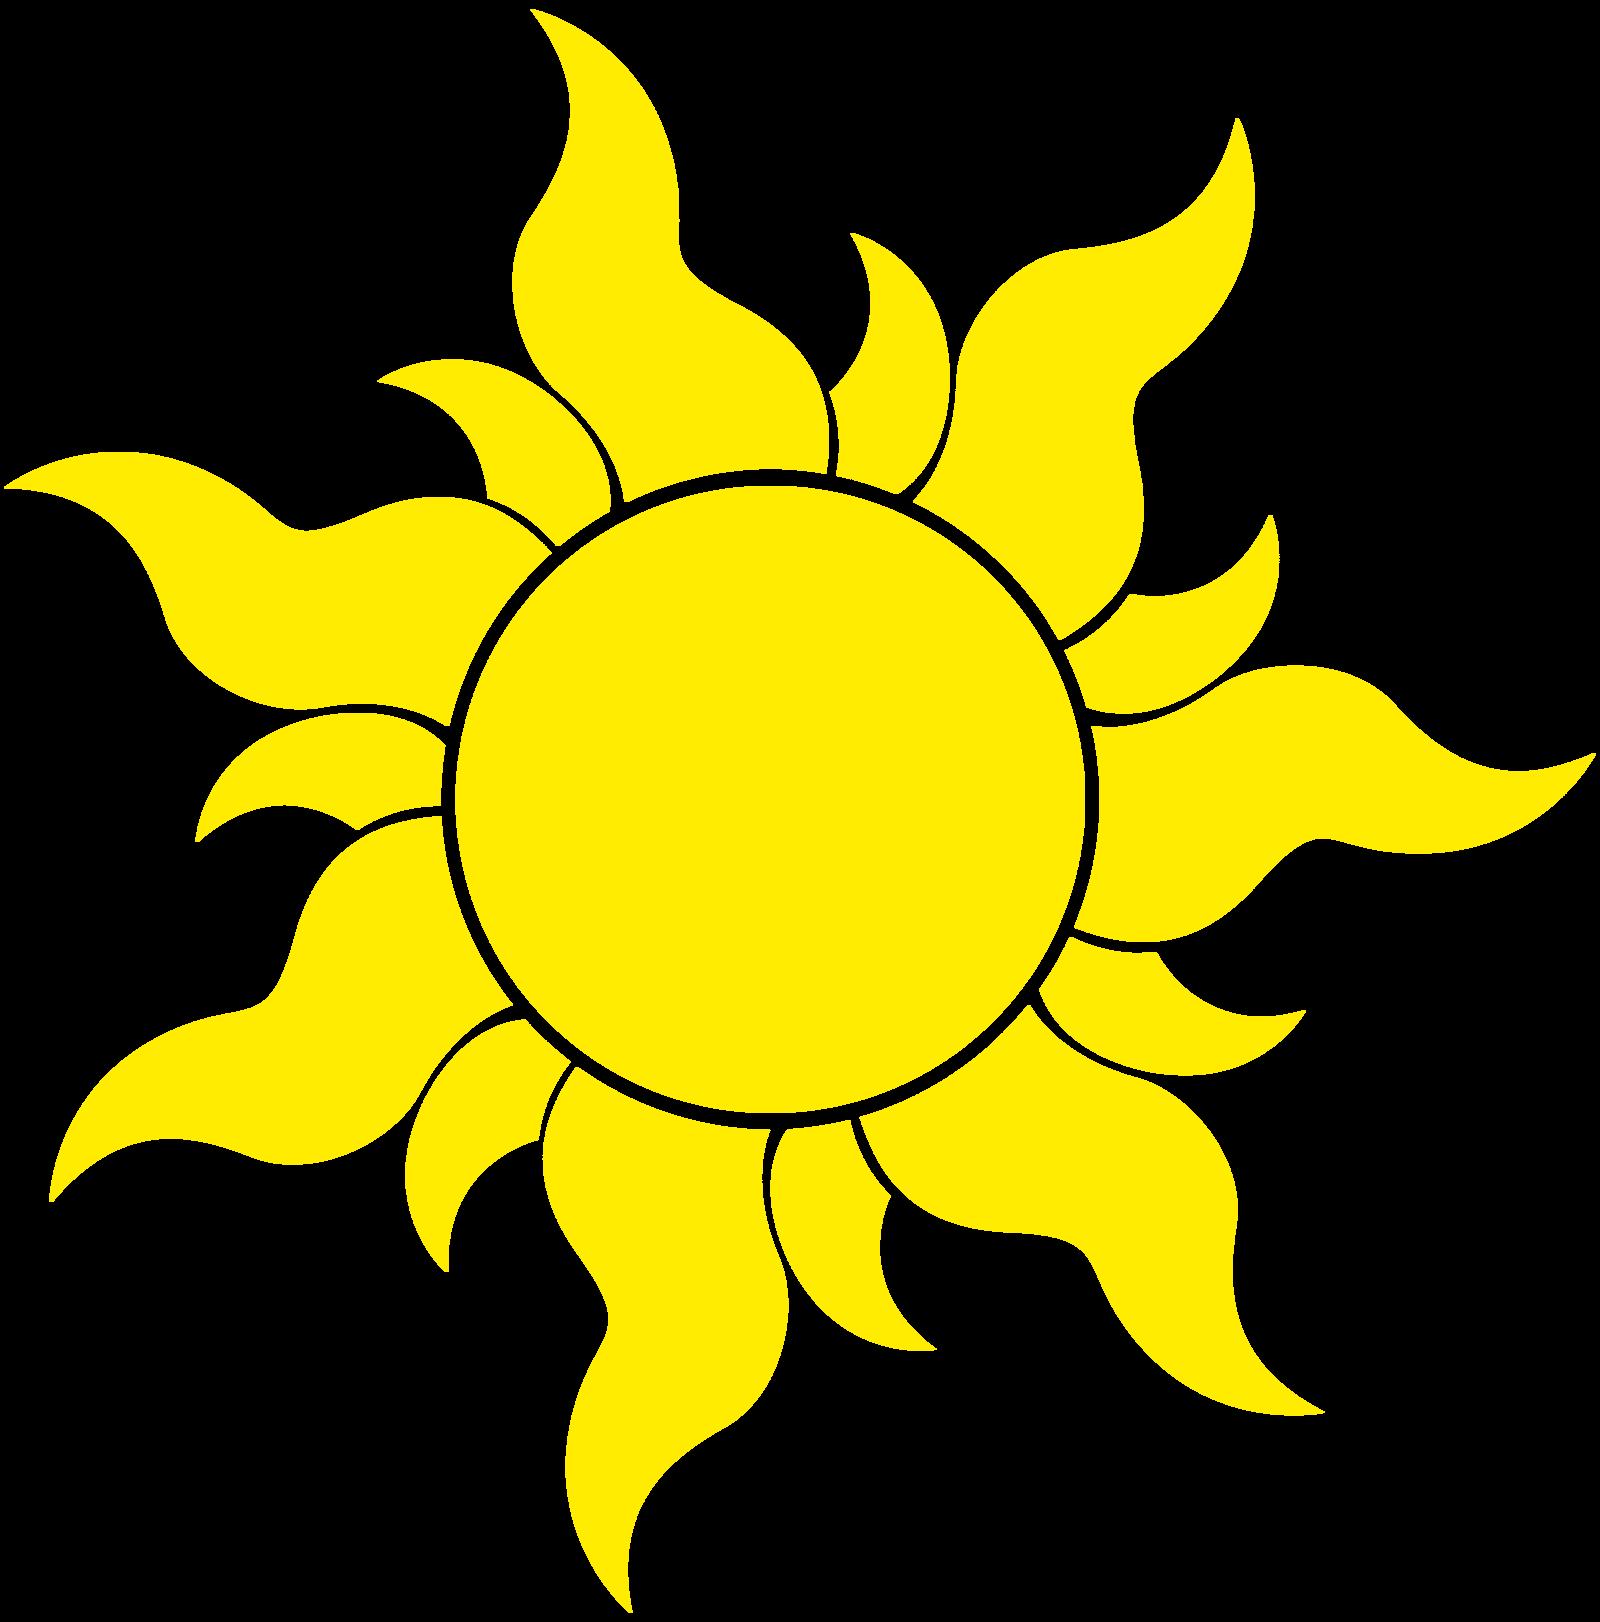 Tangled sun clipart clip art free download Sun Clipart Clipart tangled - Free Clipart on Dumielauxepices.net clip art free download